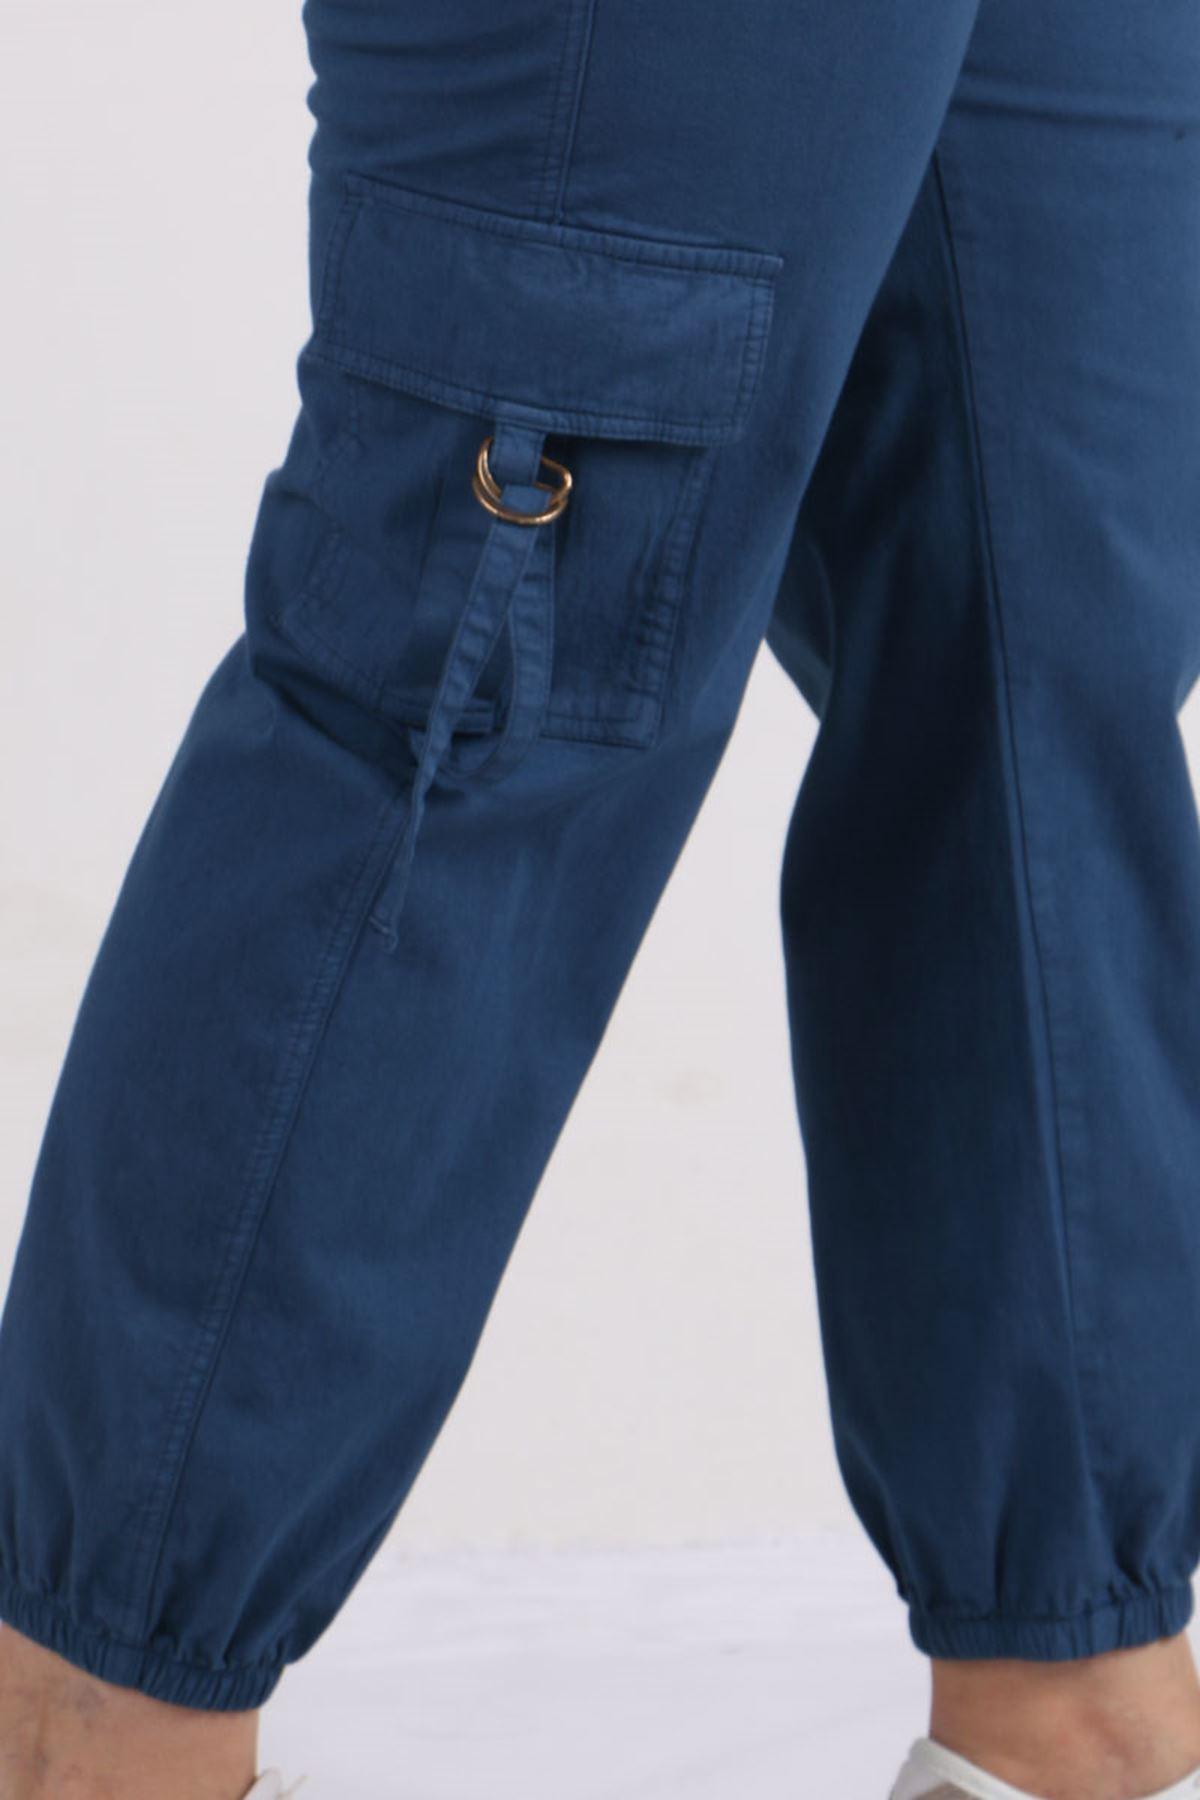 9128 Plus Size Cargo Pants with Pockets - Indigo